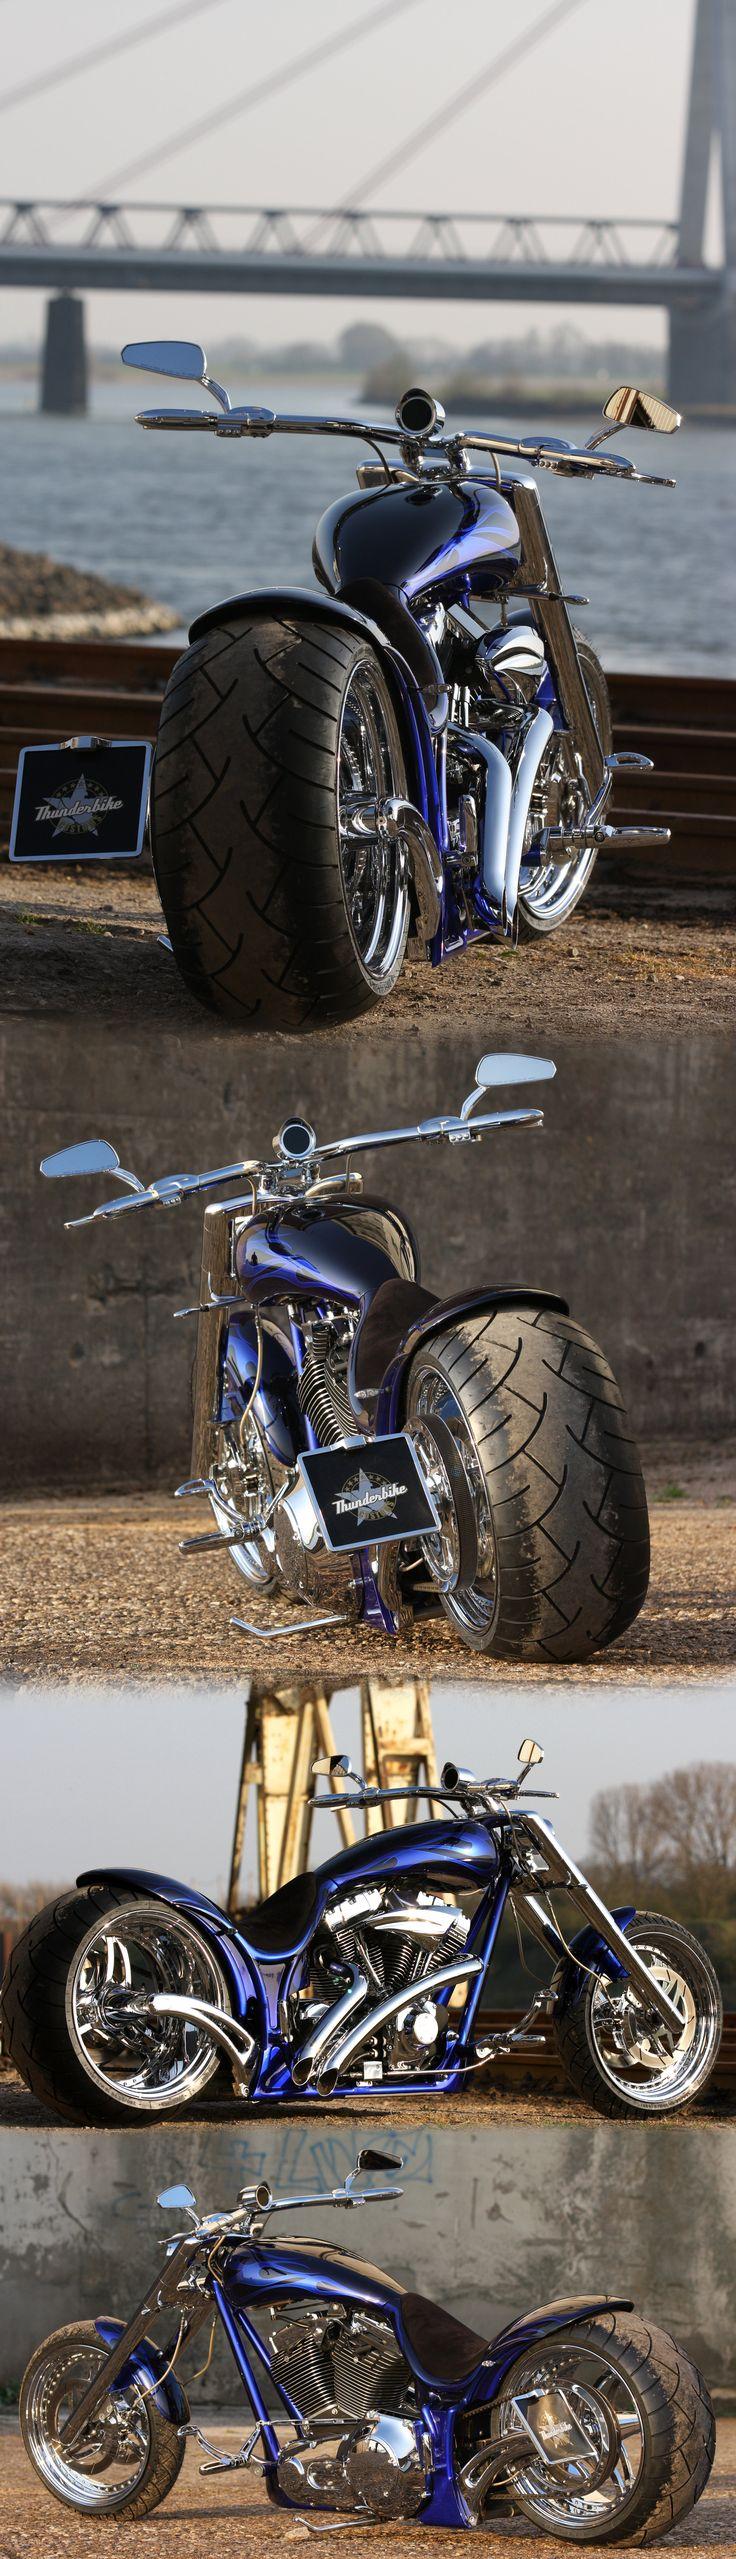 """Blue Flame"" by Thunderbike Customs - Harley-Davidson Screamin Eagle engine powered custombike"